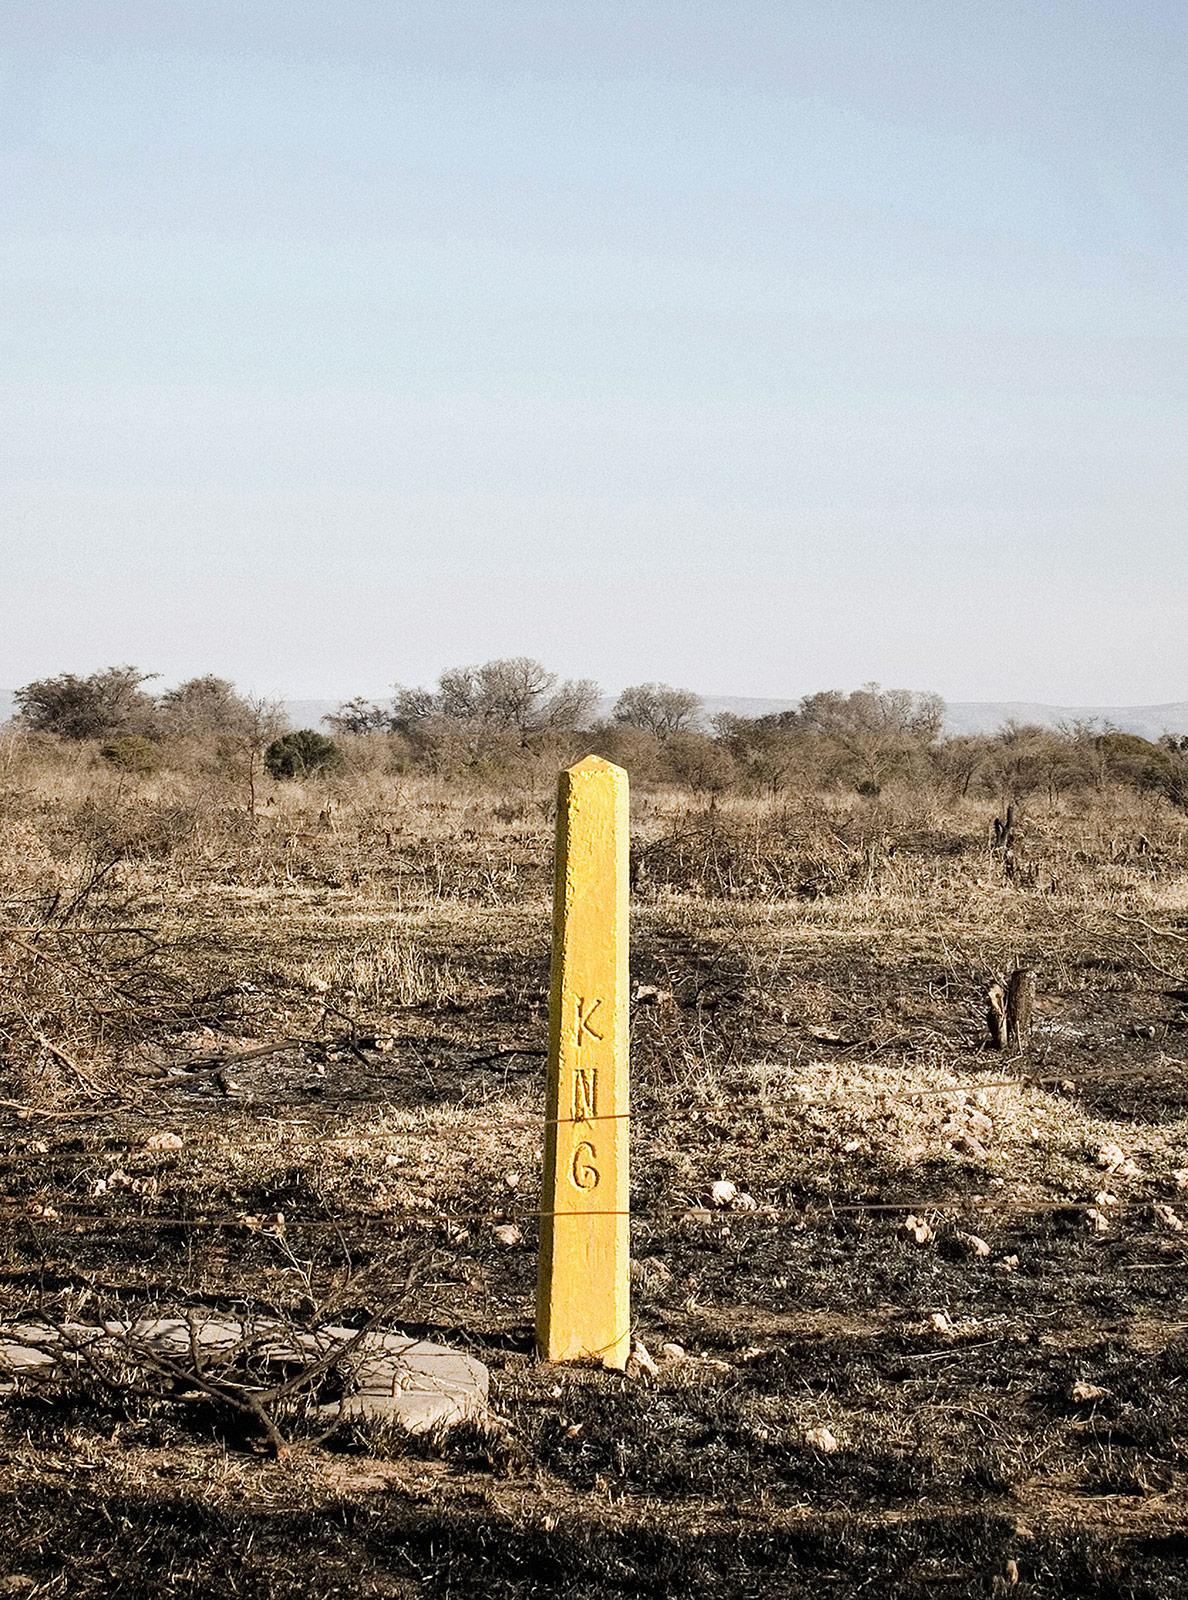 Thabiso sekgala  homeland  landmark  troya  former kwandebele  2009  courtesy of the artist and goodman gallery